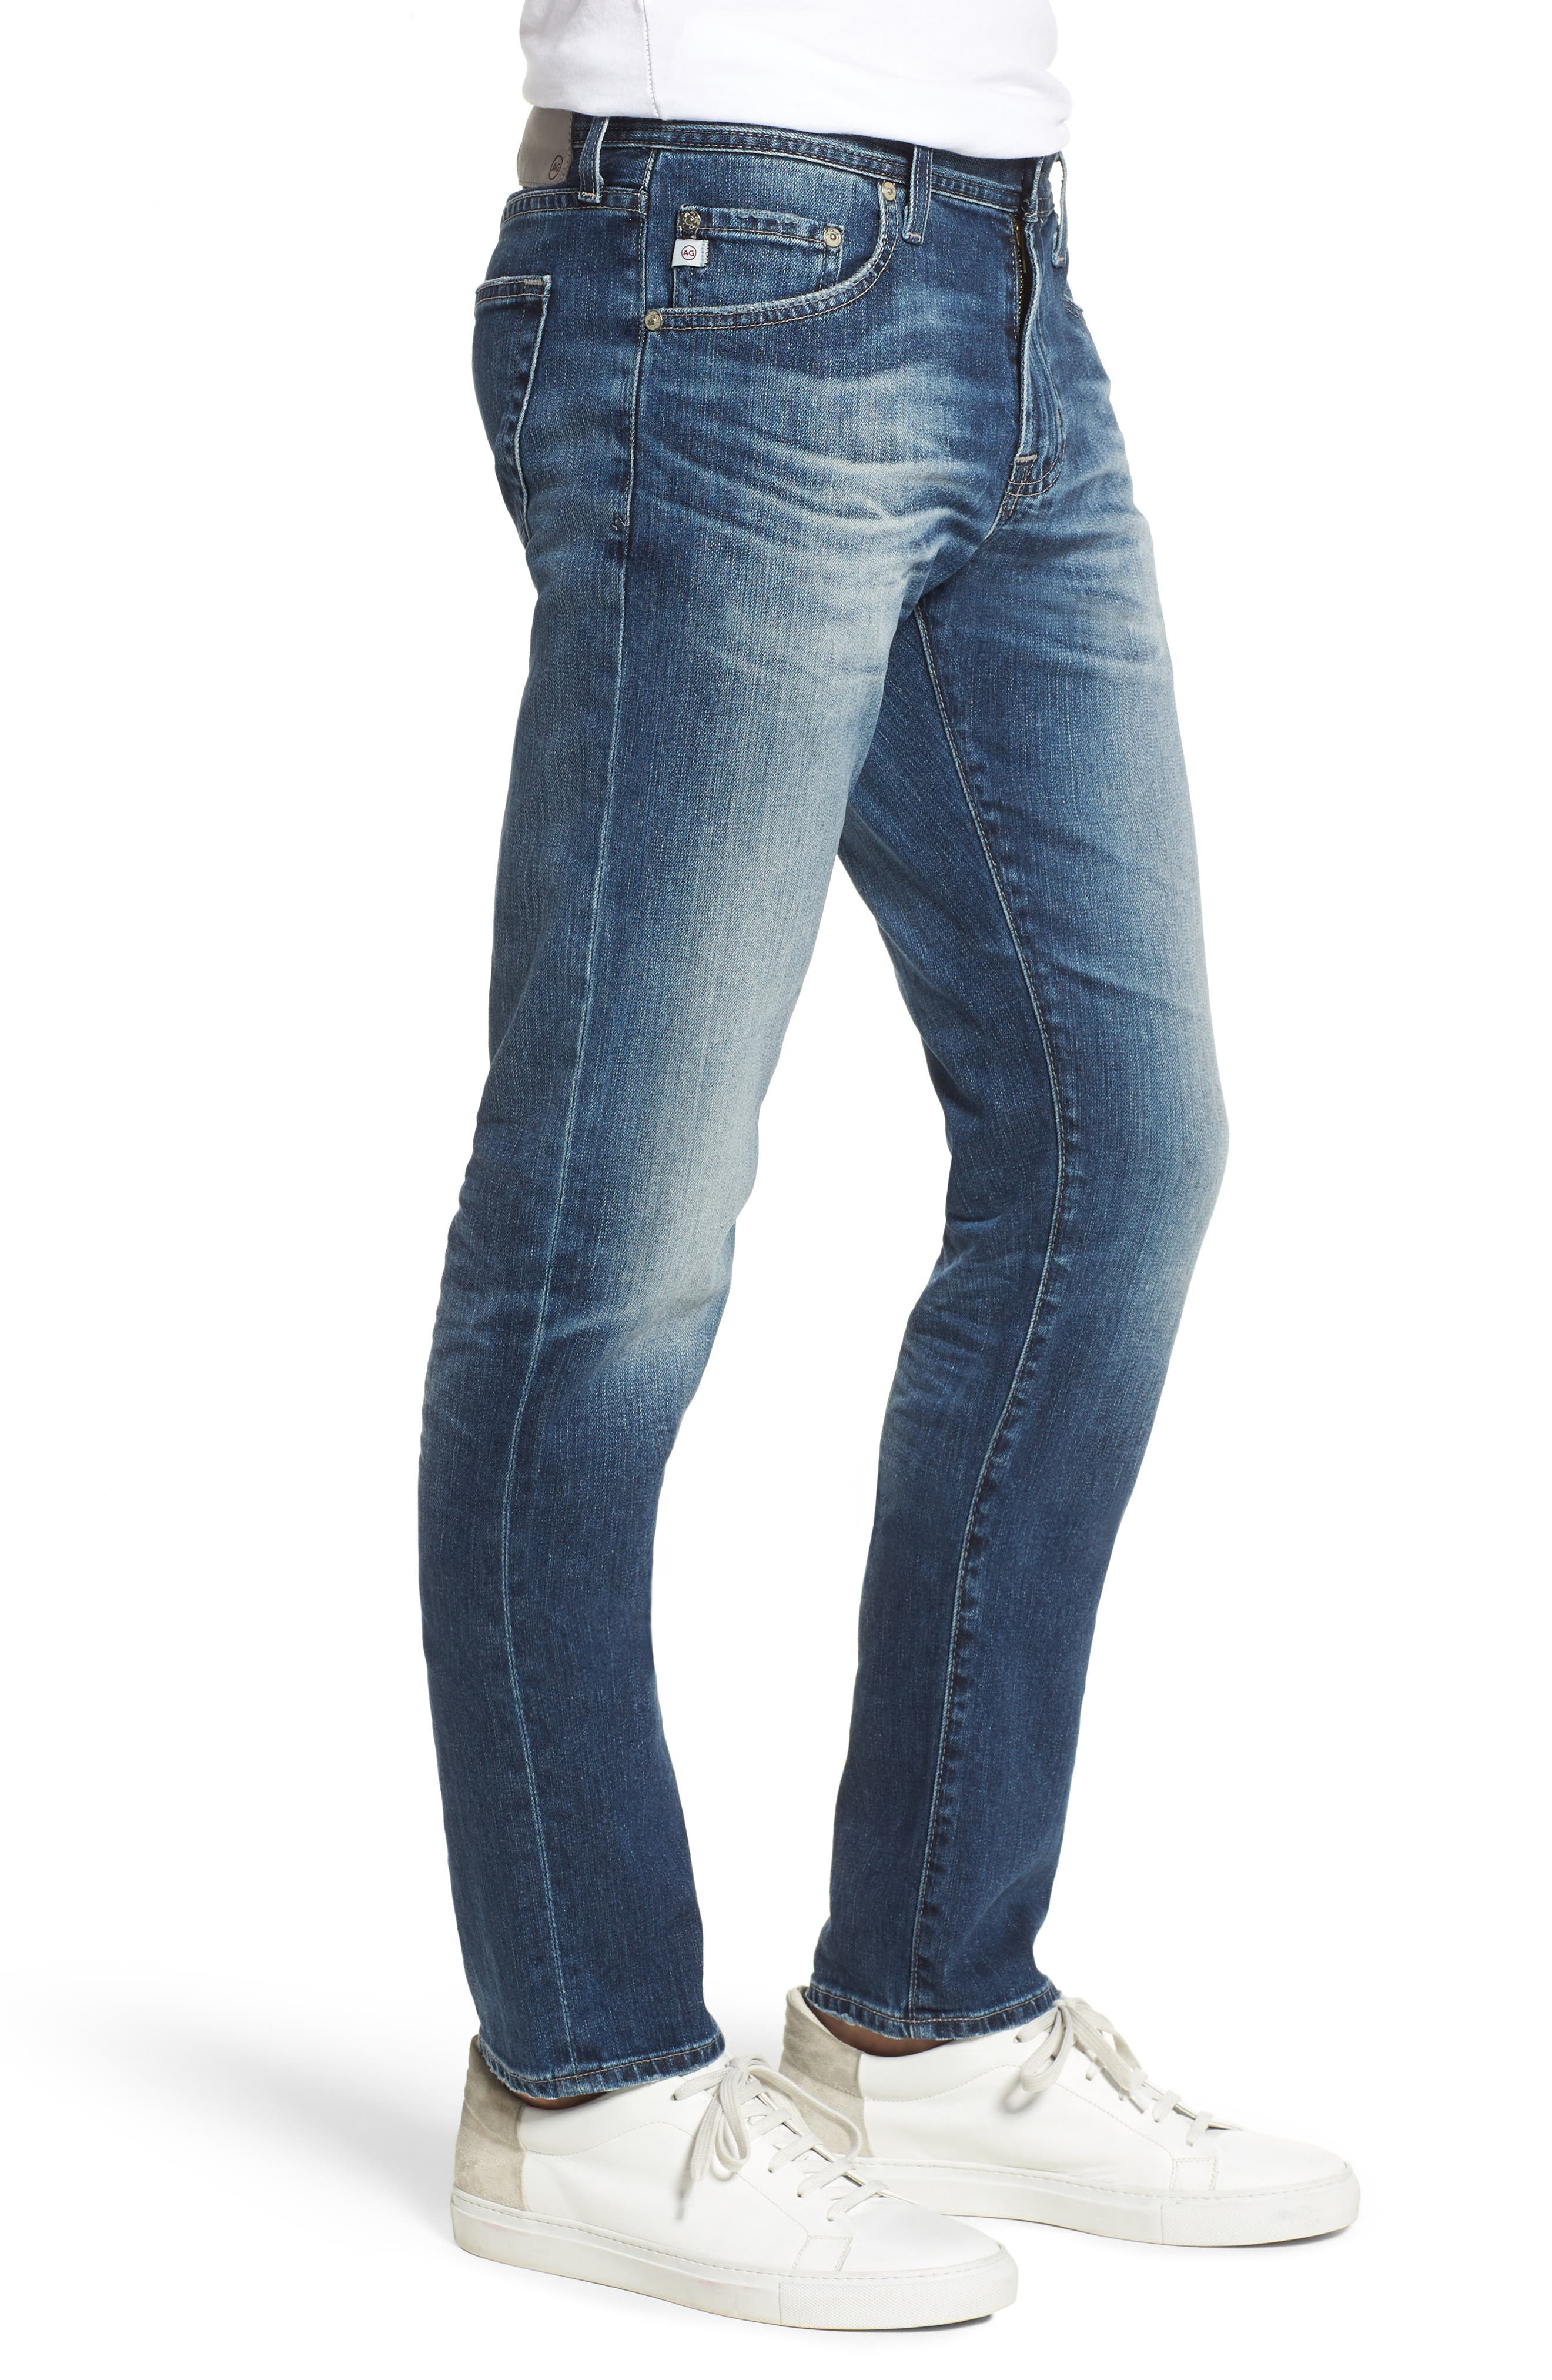 Tellis Slim Fit Jeans,                             Alternate thumbnail 3, color,                             12 YEARS MAVERICKS